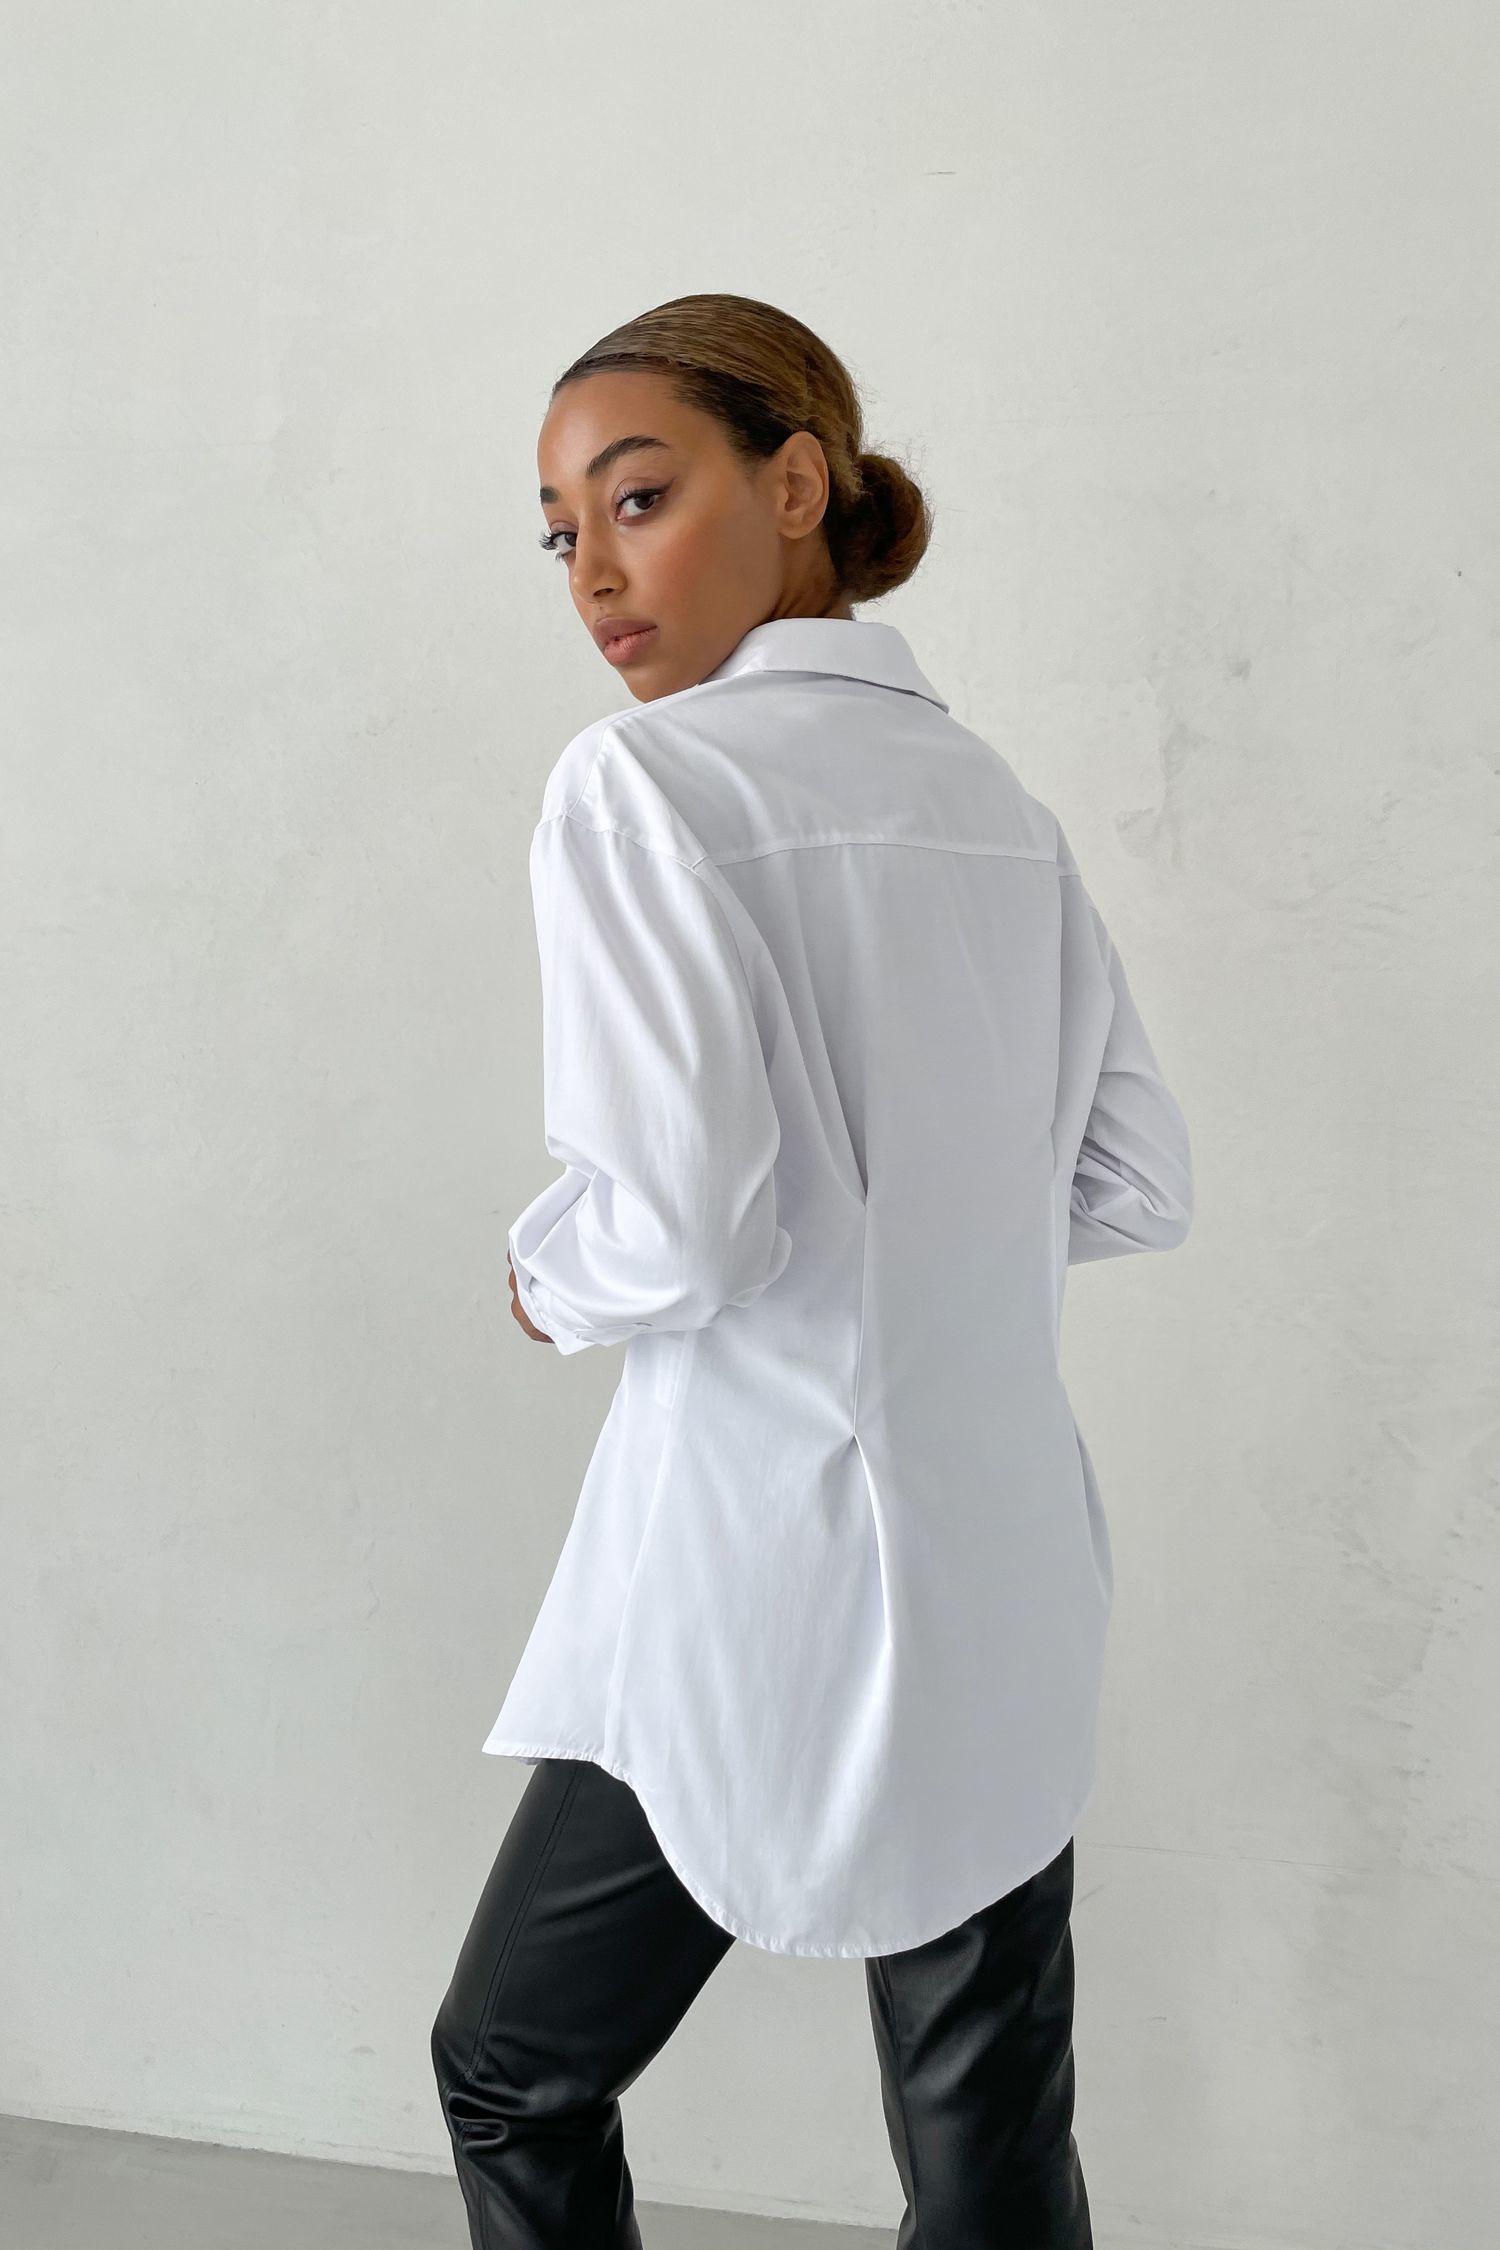 Рубашка белая с защипами - THE LACE